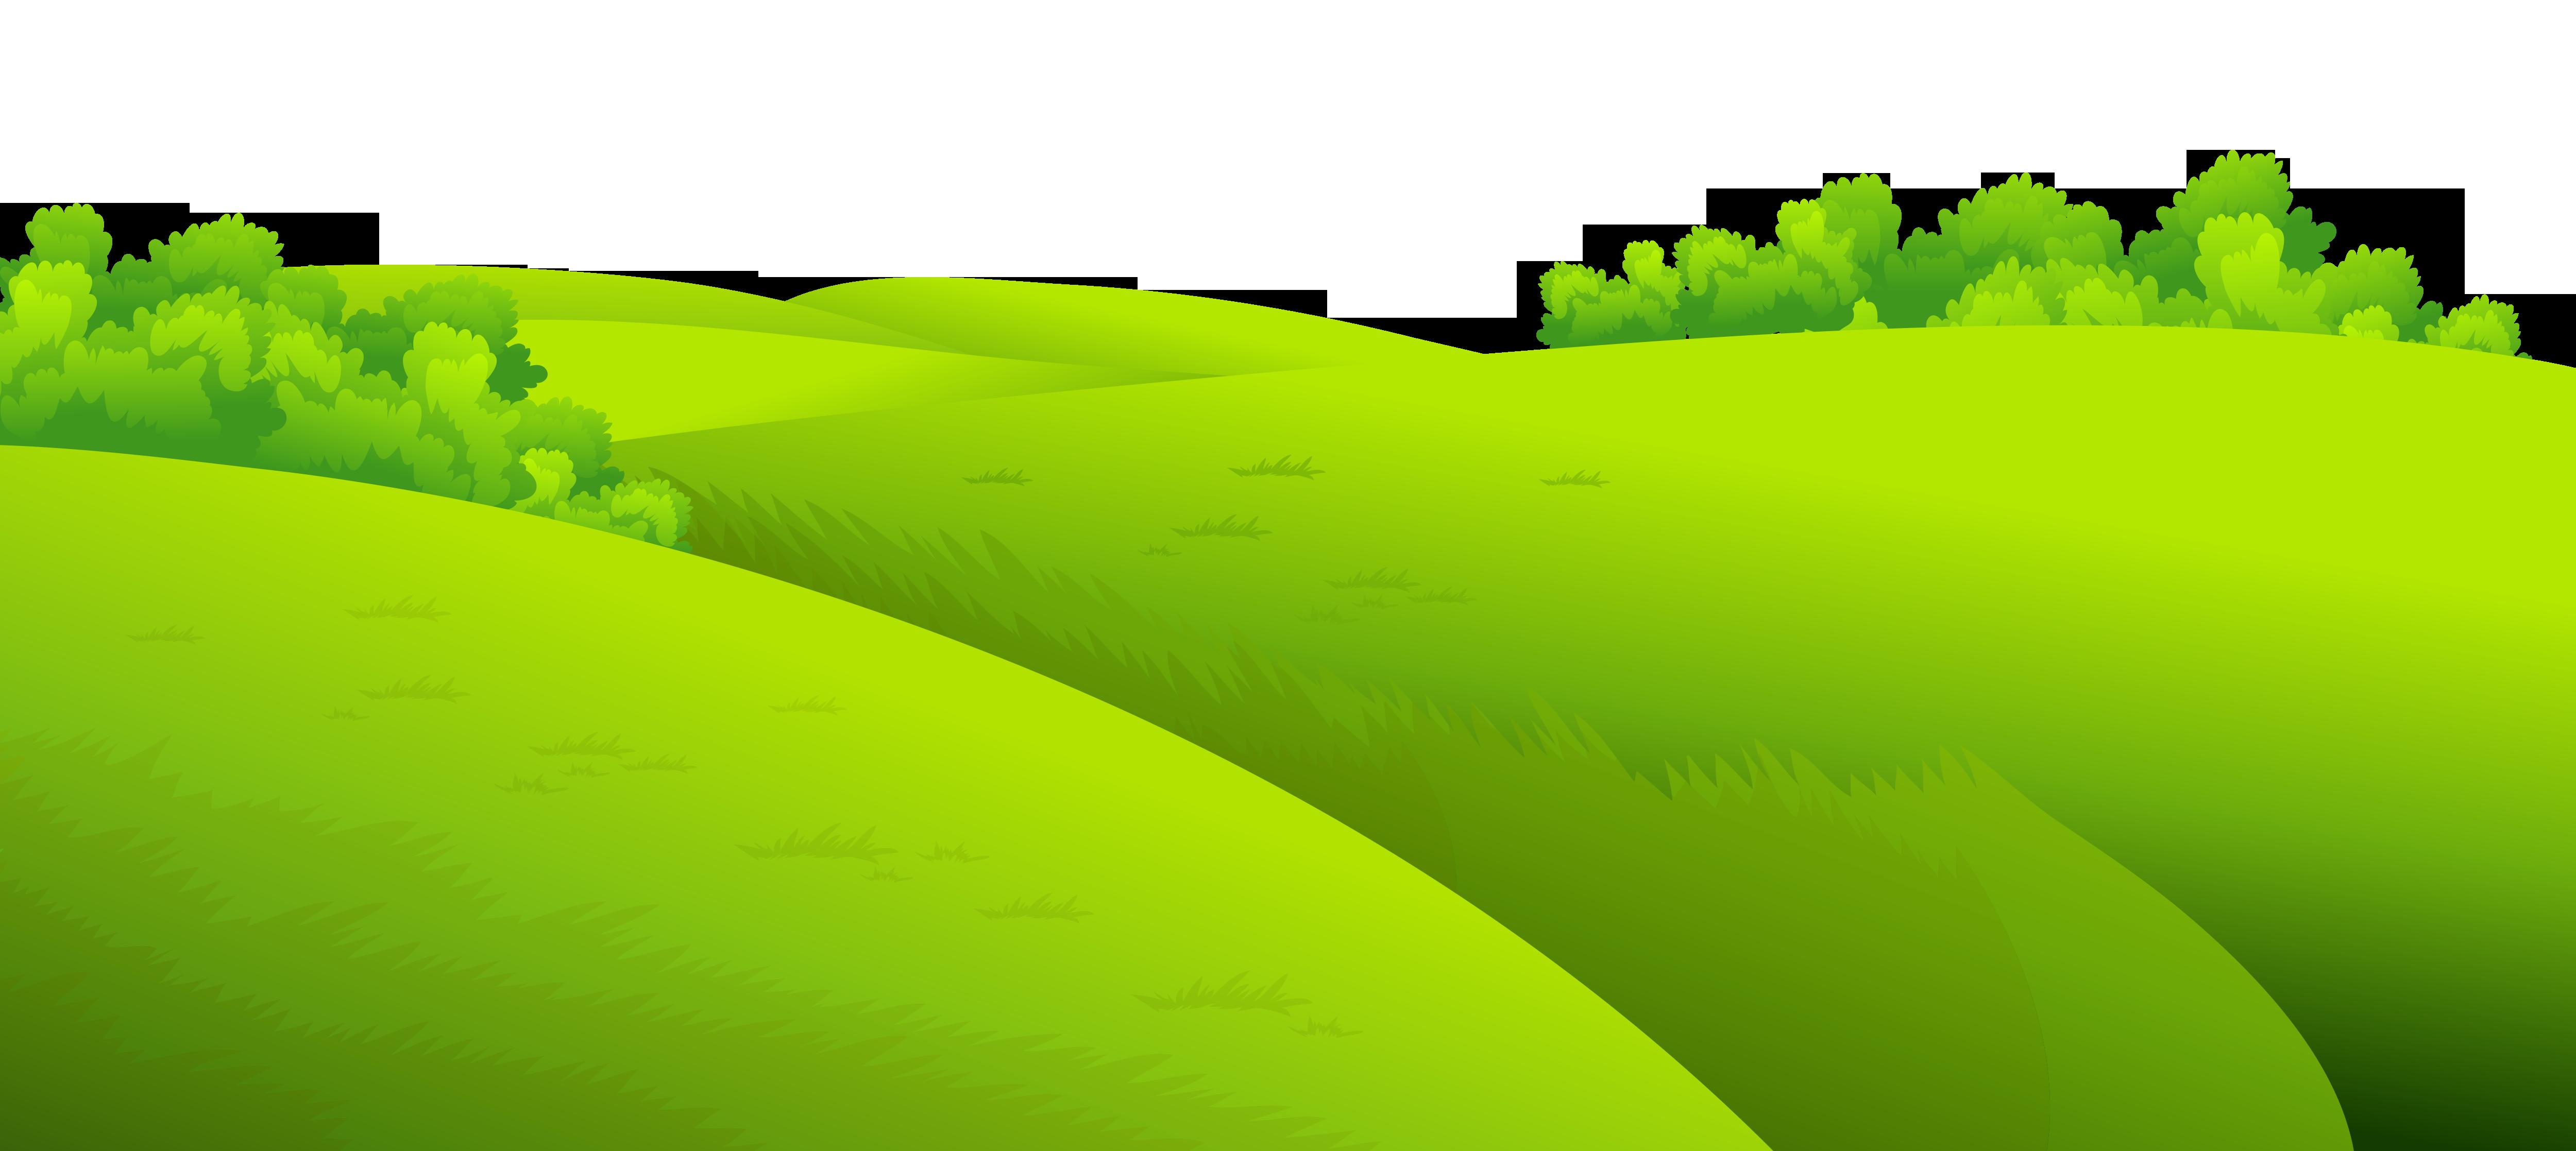 Green Grass Ground PNG Clip art | Gallery Yopriceville - High ...